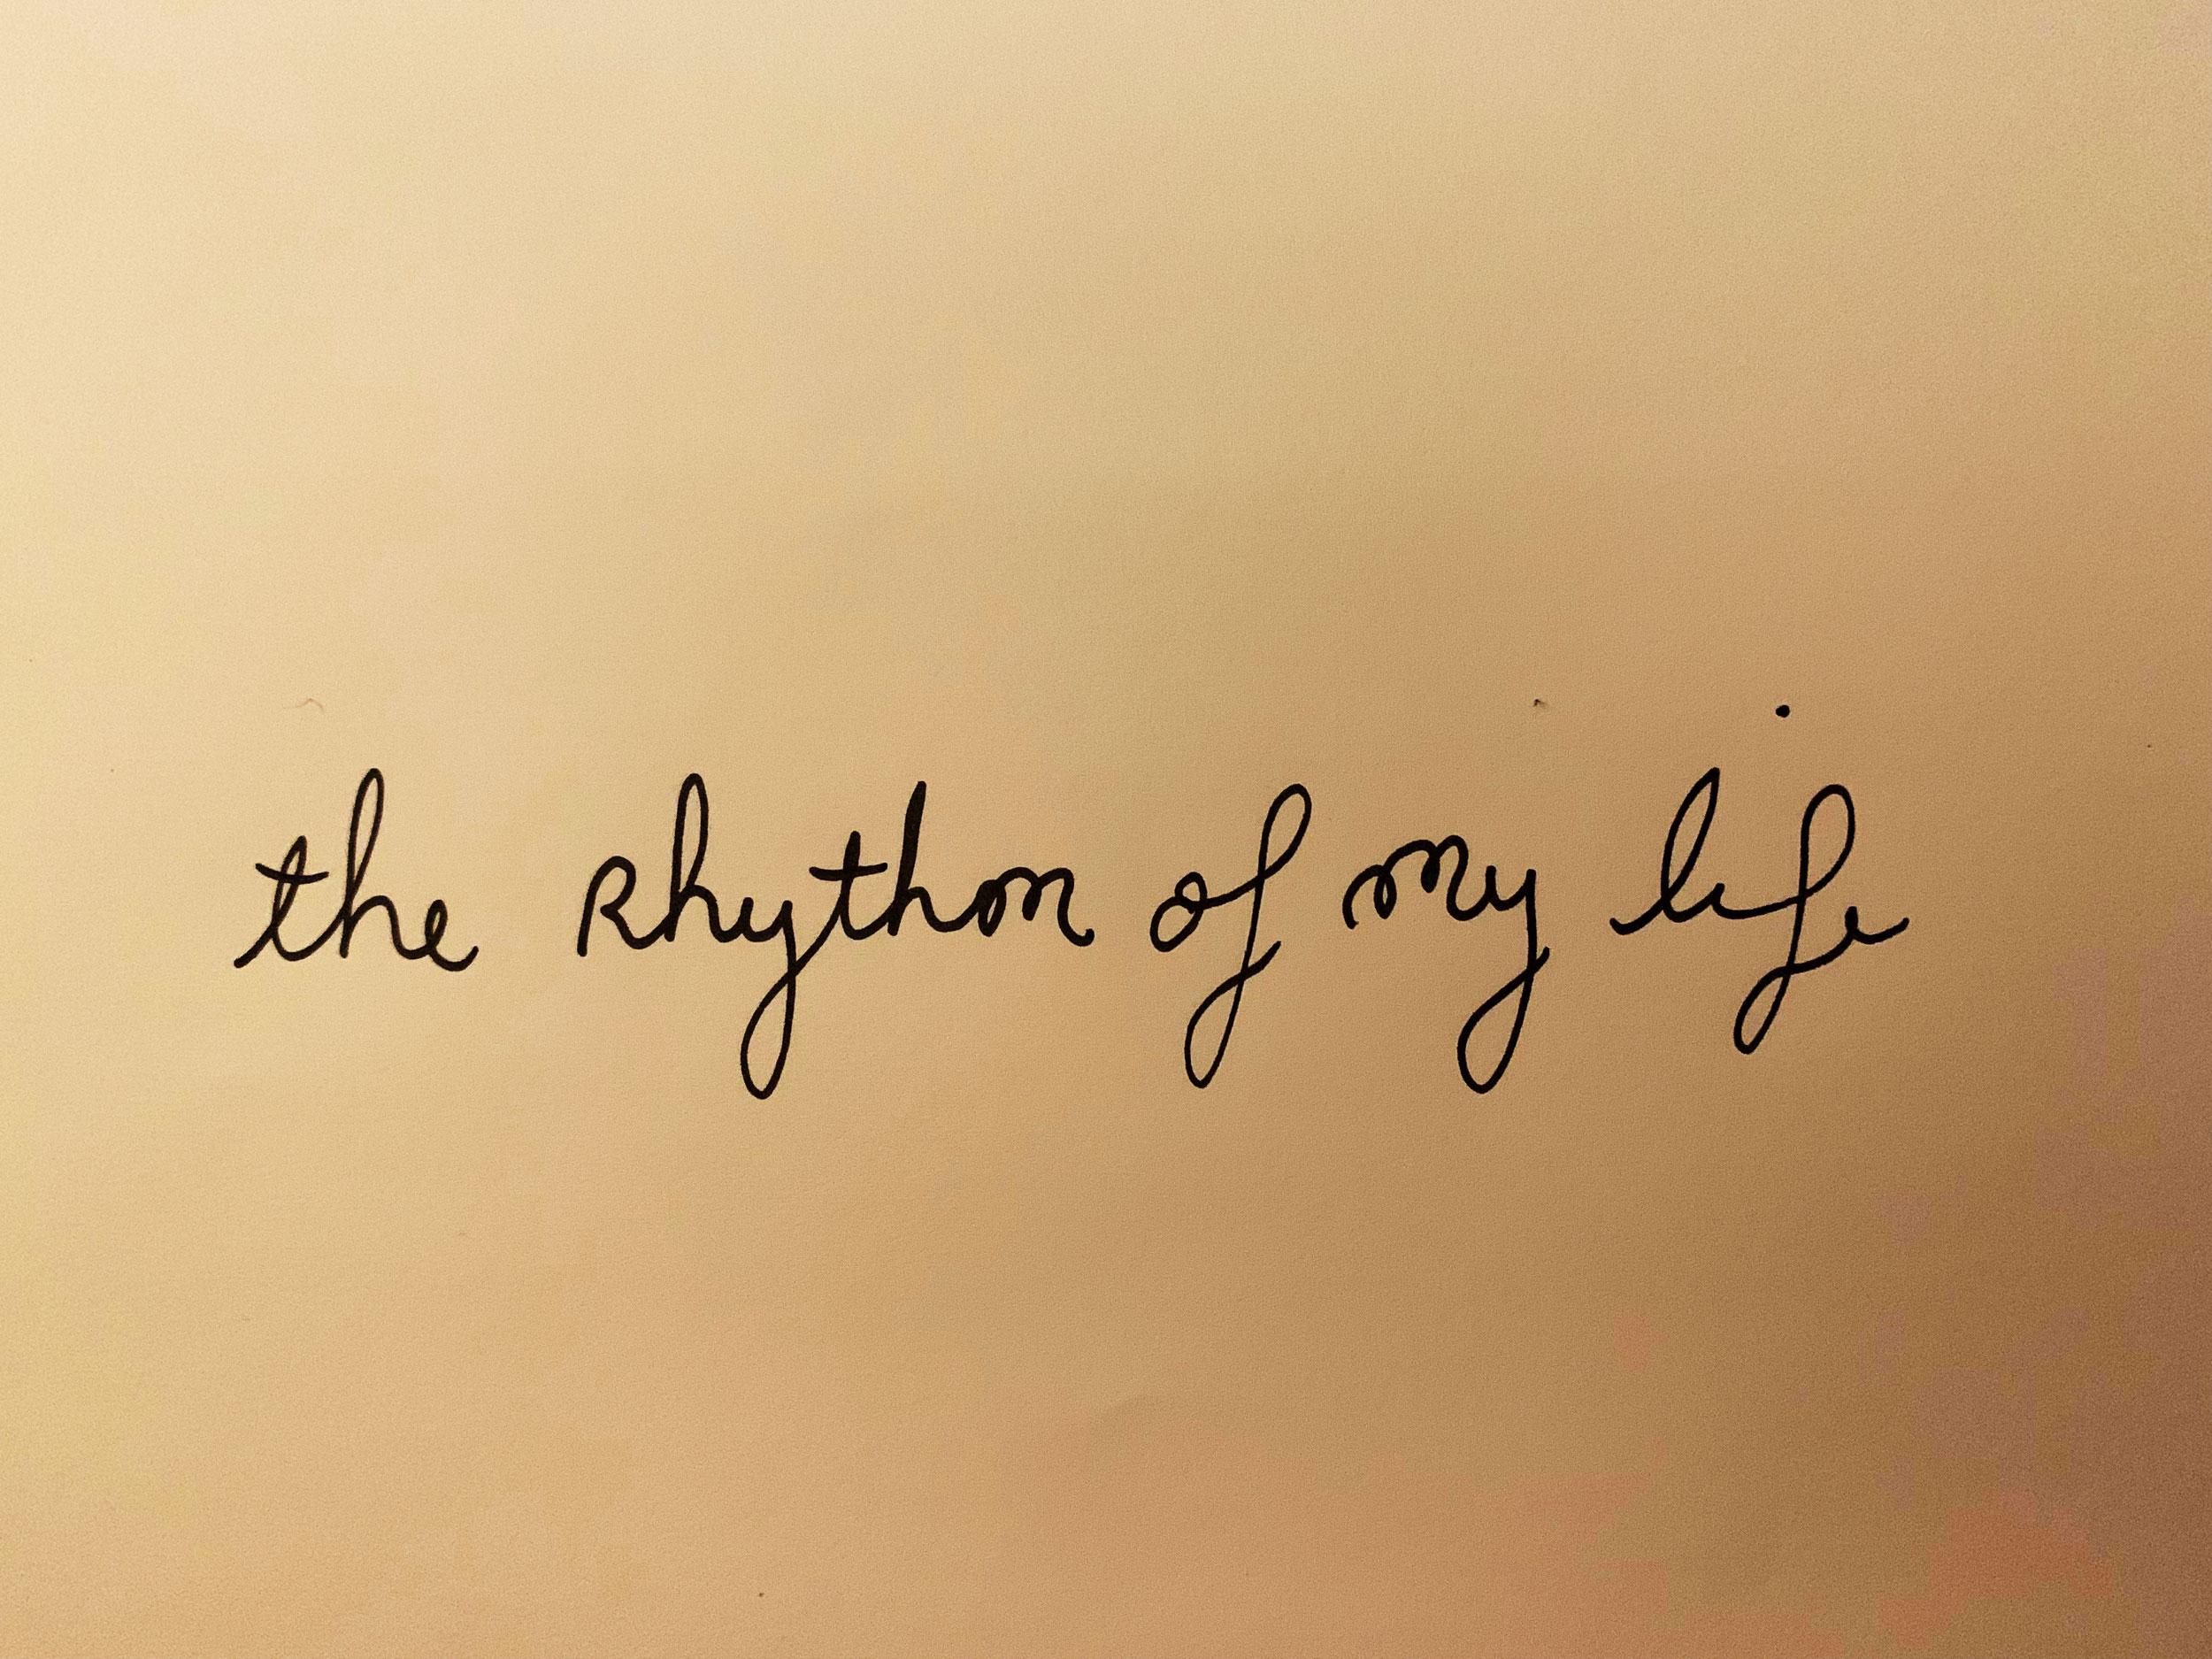 The rhythms of my life. Drawing Luke Hockley.